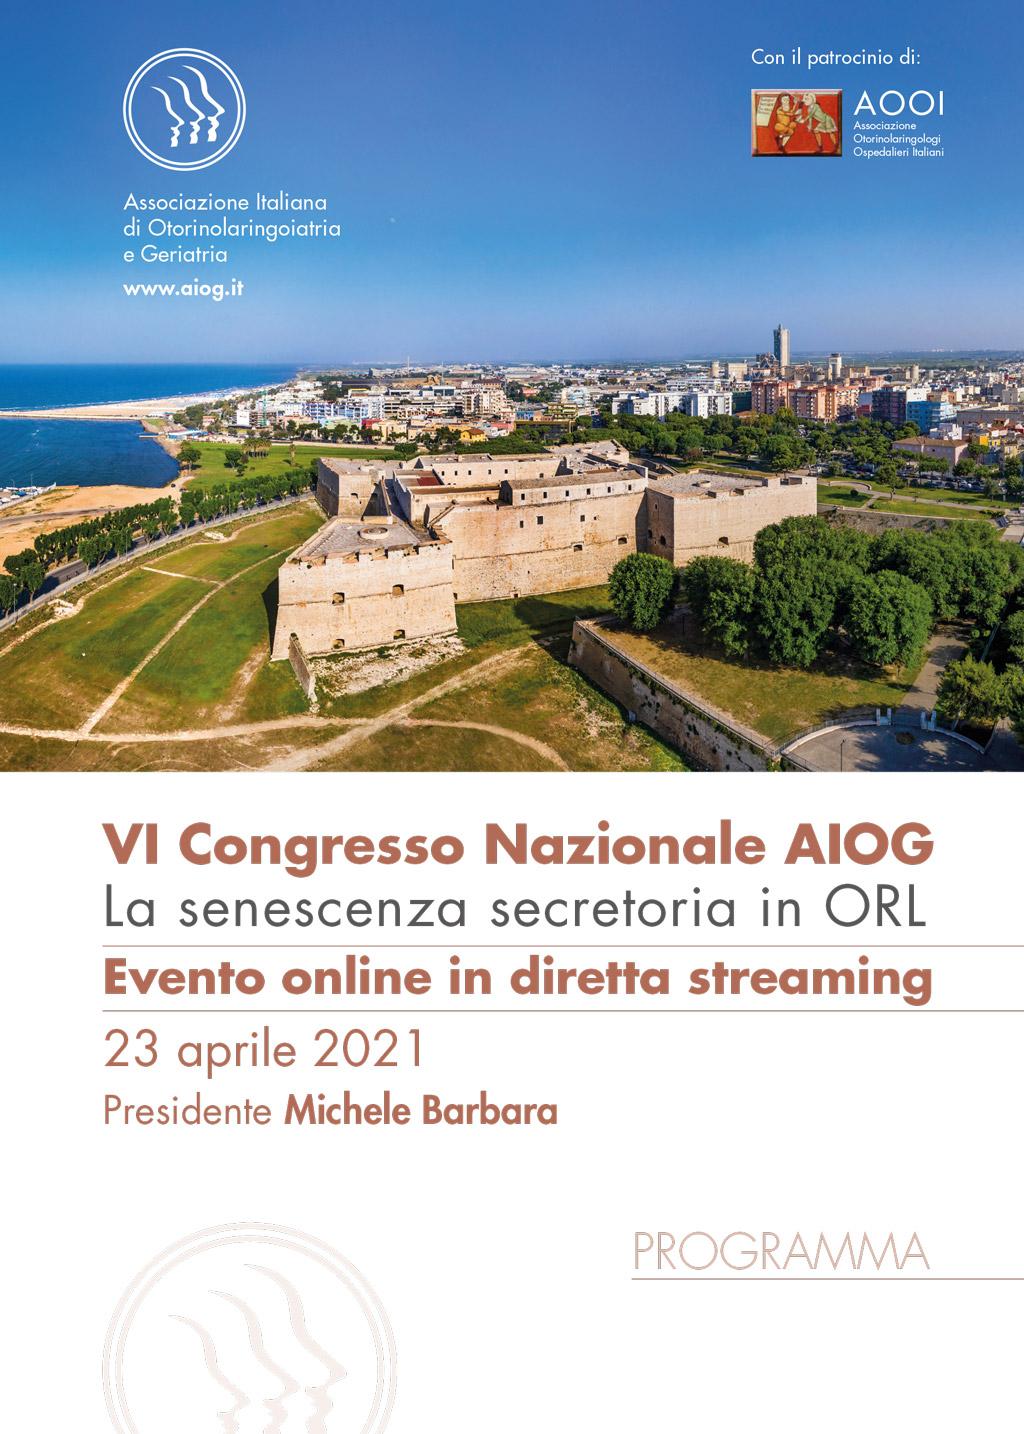 AIOG21_programma-1